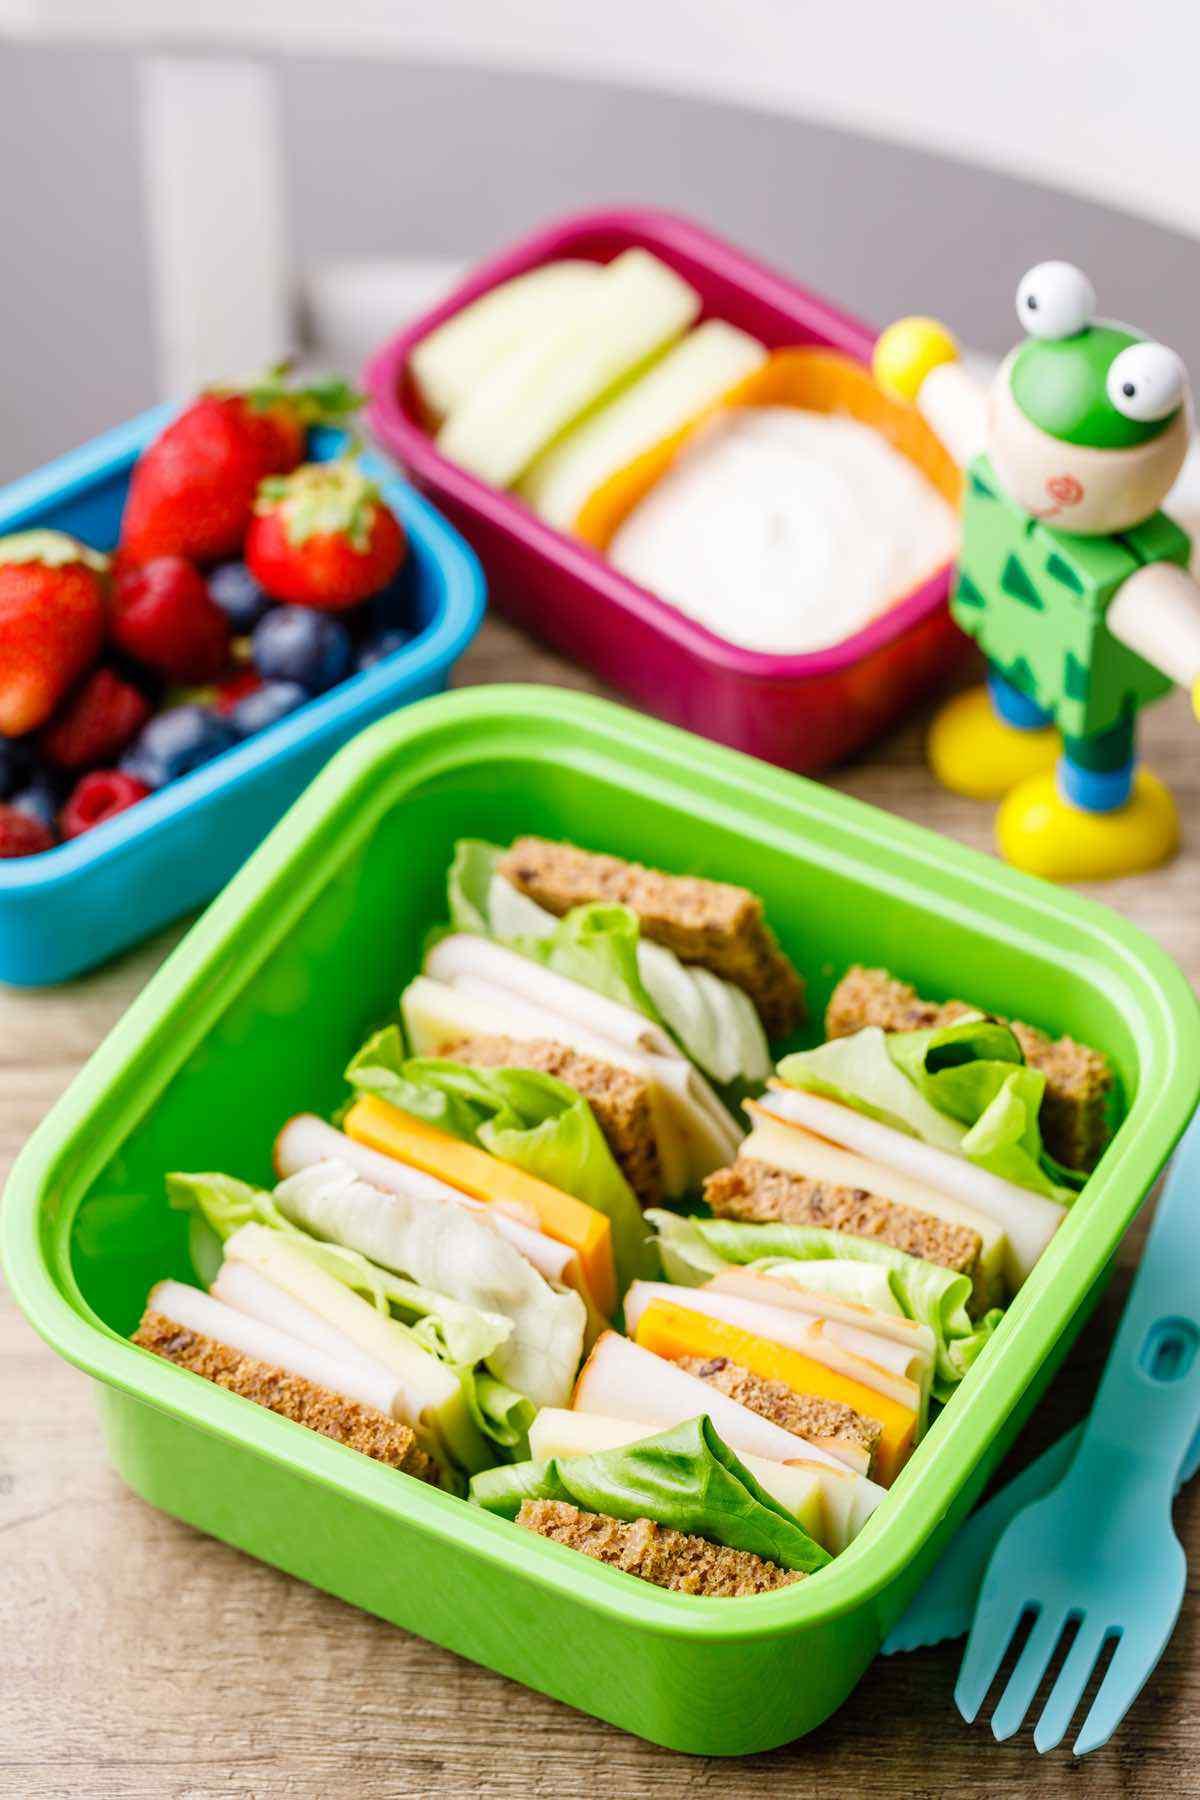 Kids Bento Box Lunch